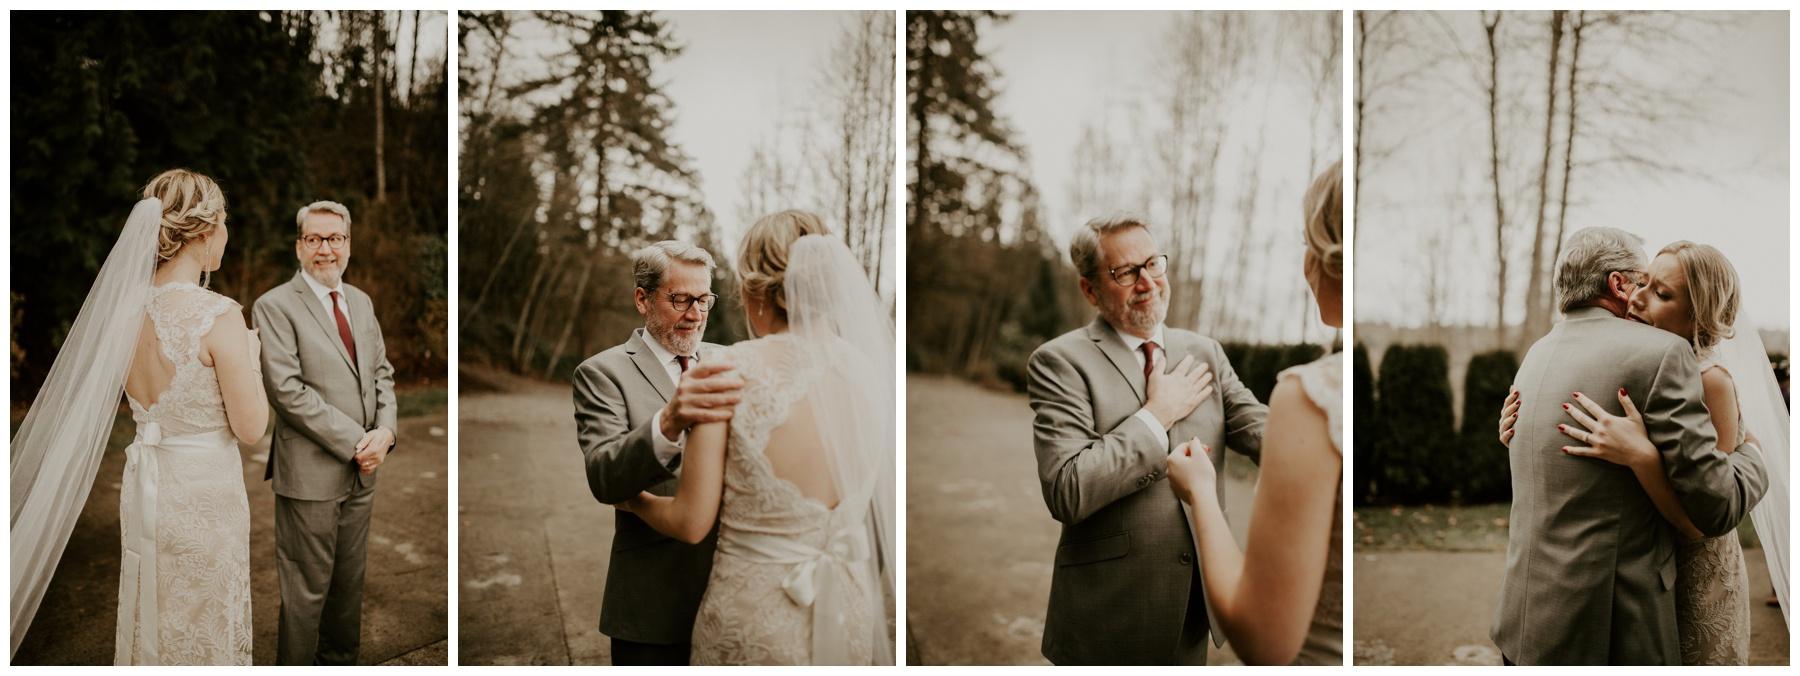 winter snowy intimate wedding_0011.jpg